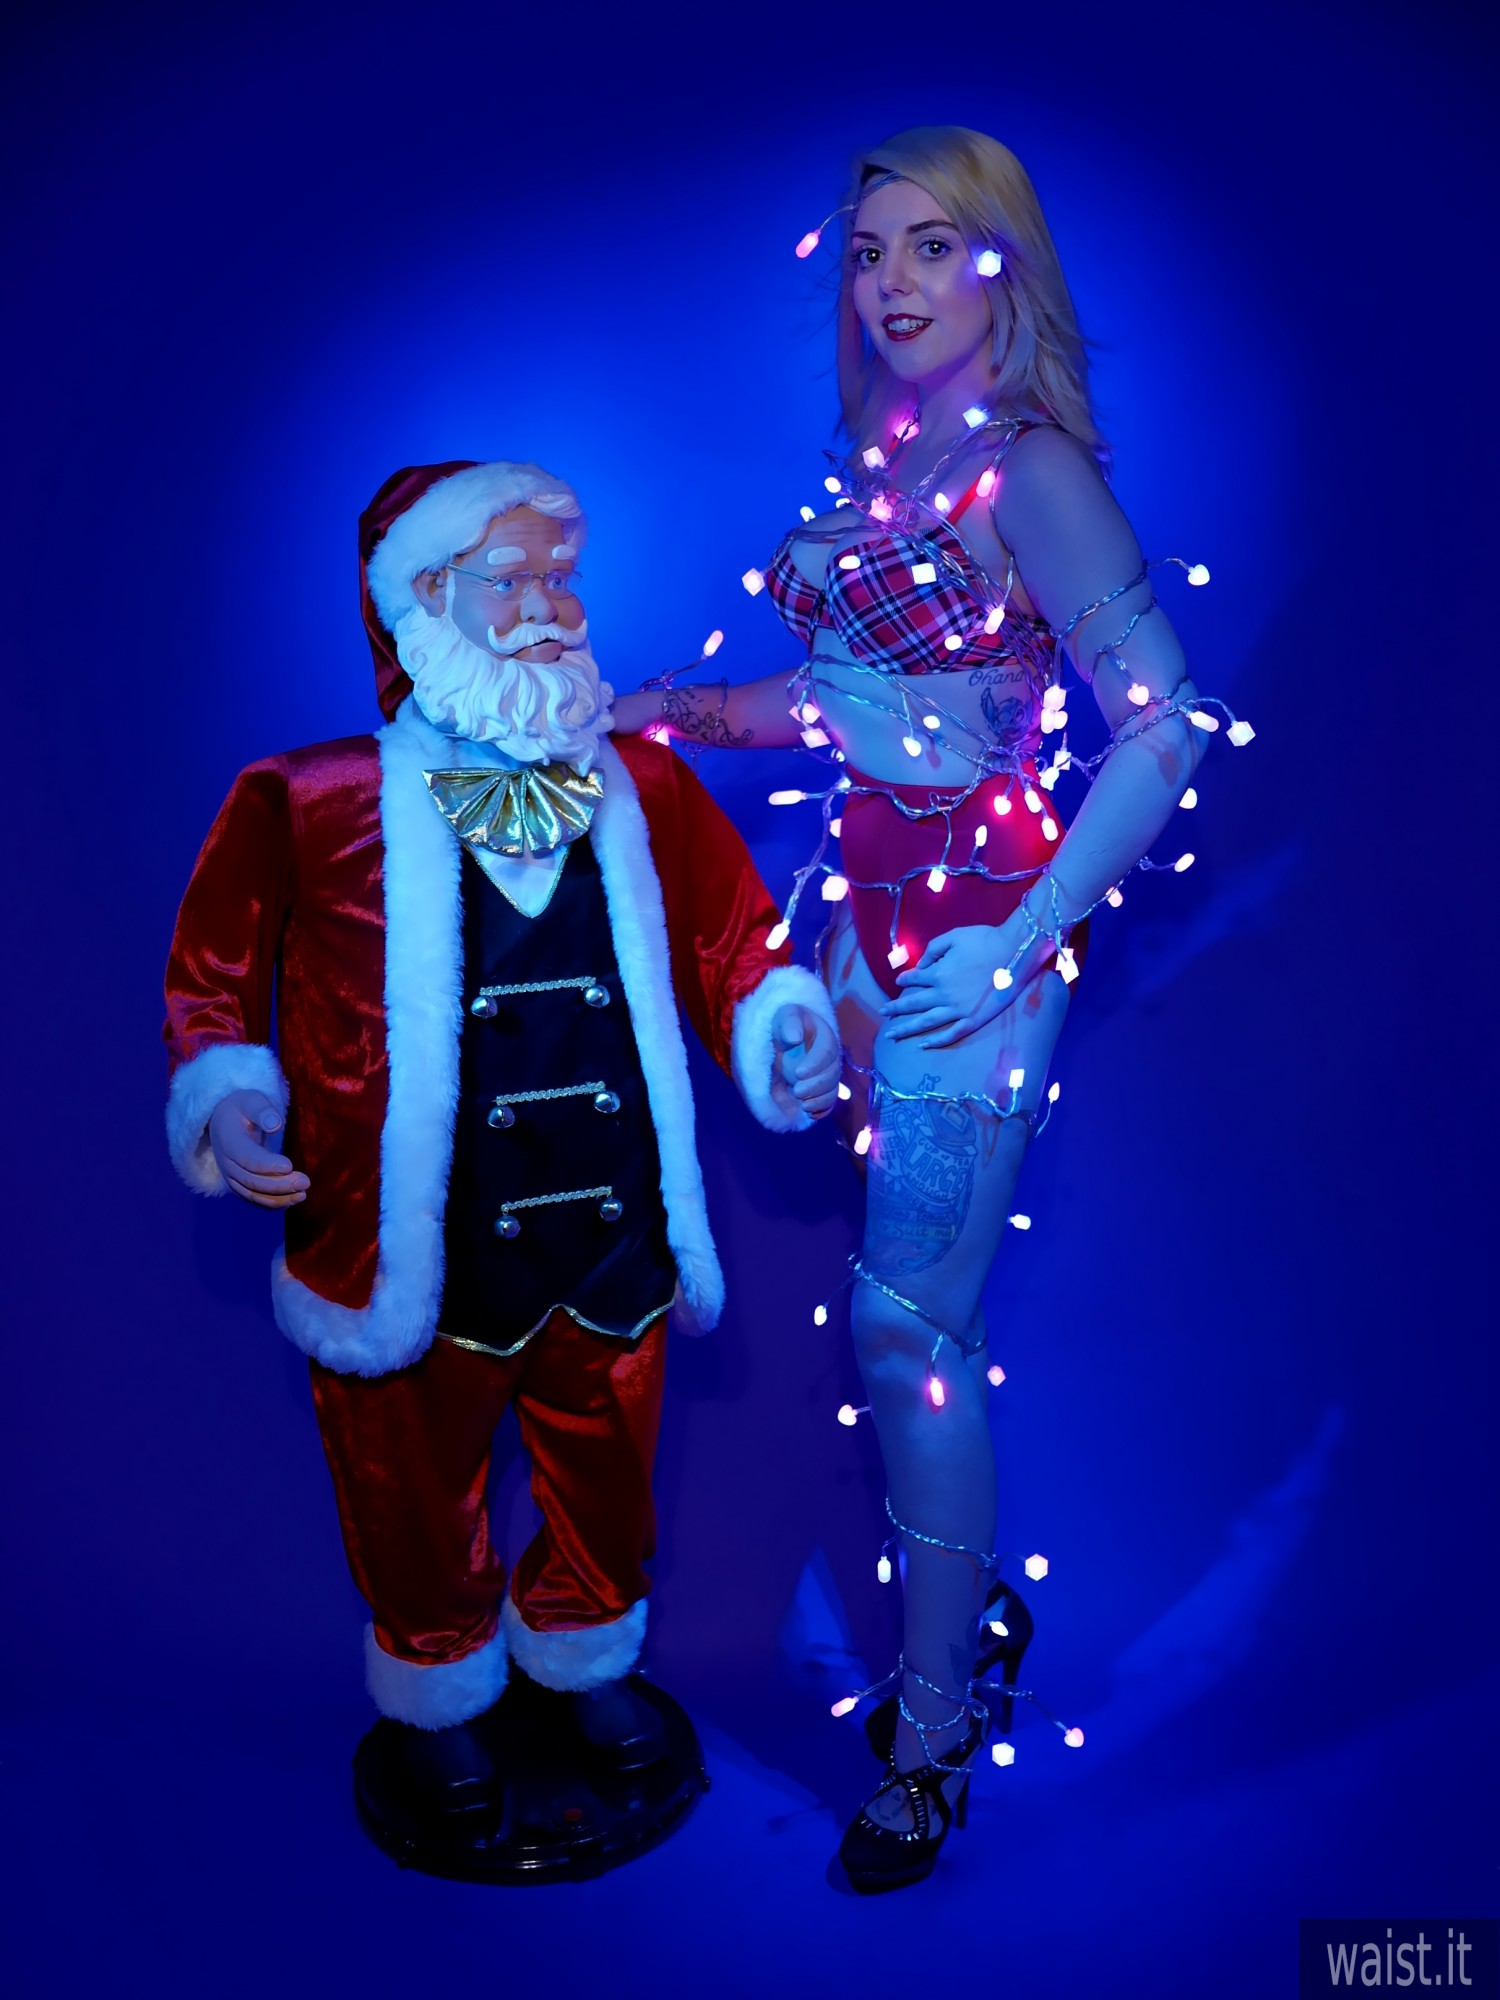 2017-02-12 Pixiee-Lou pinup/Christmas shoot